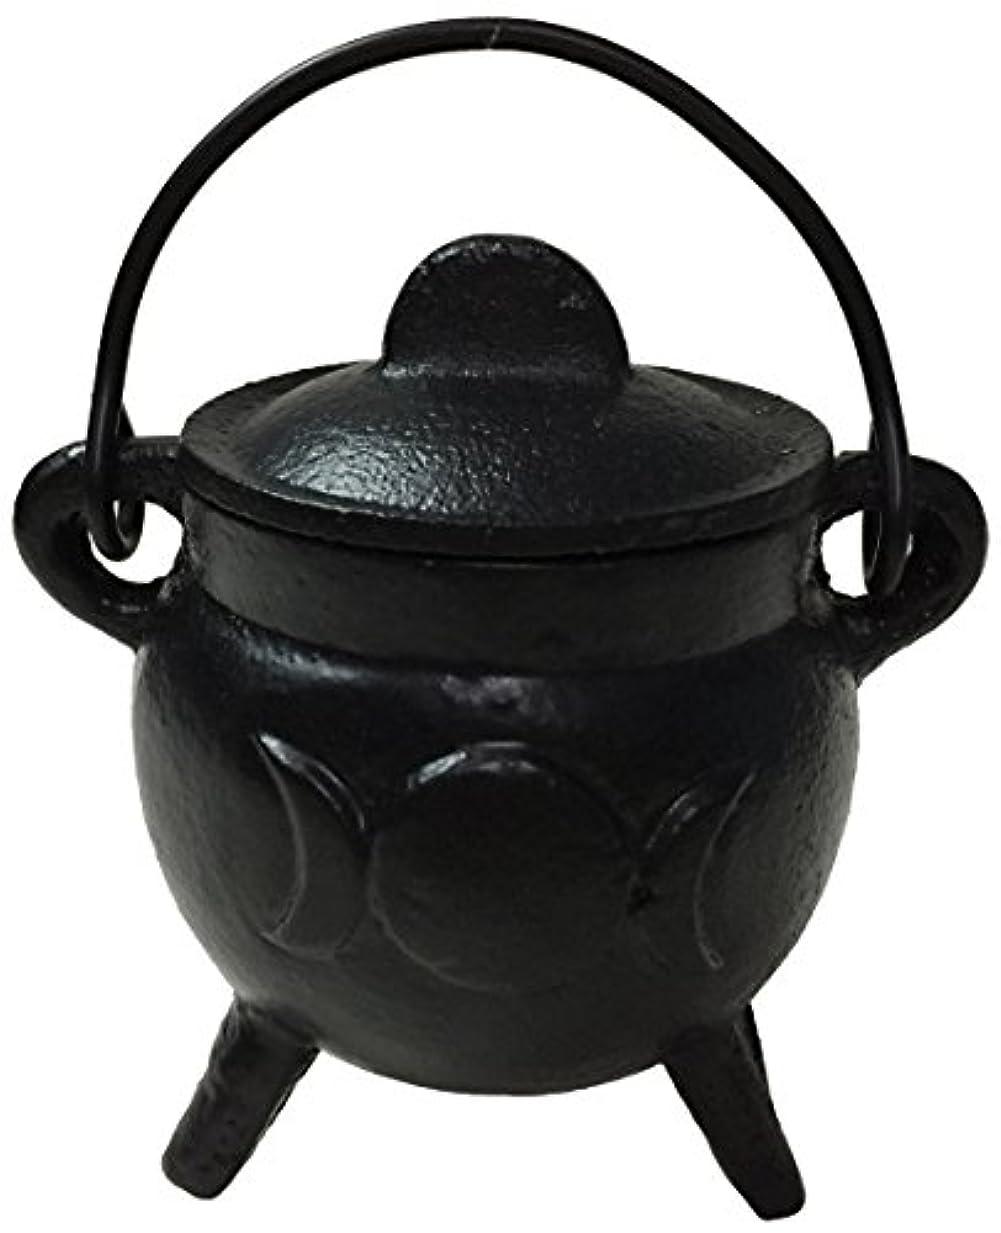 Vrinda Cast Iron Cauldron Burner with Lid Triple Moon